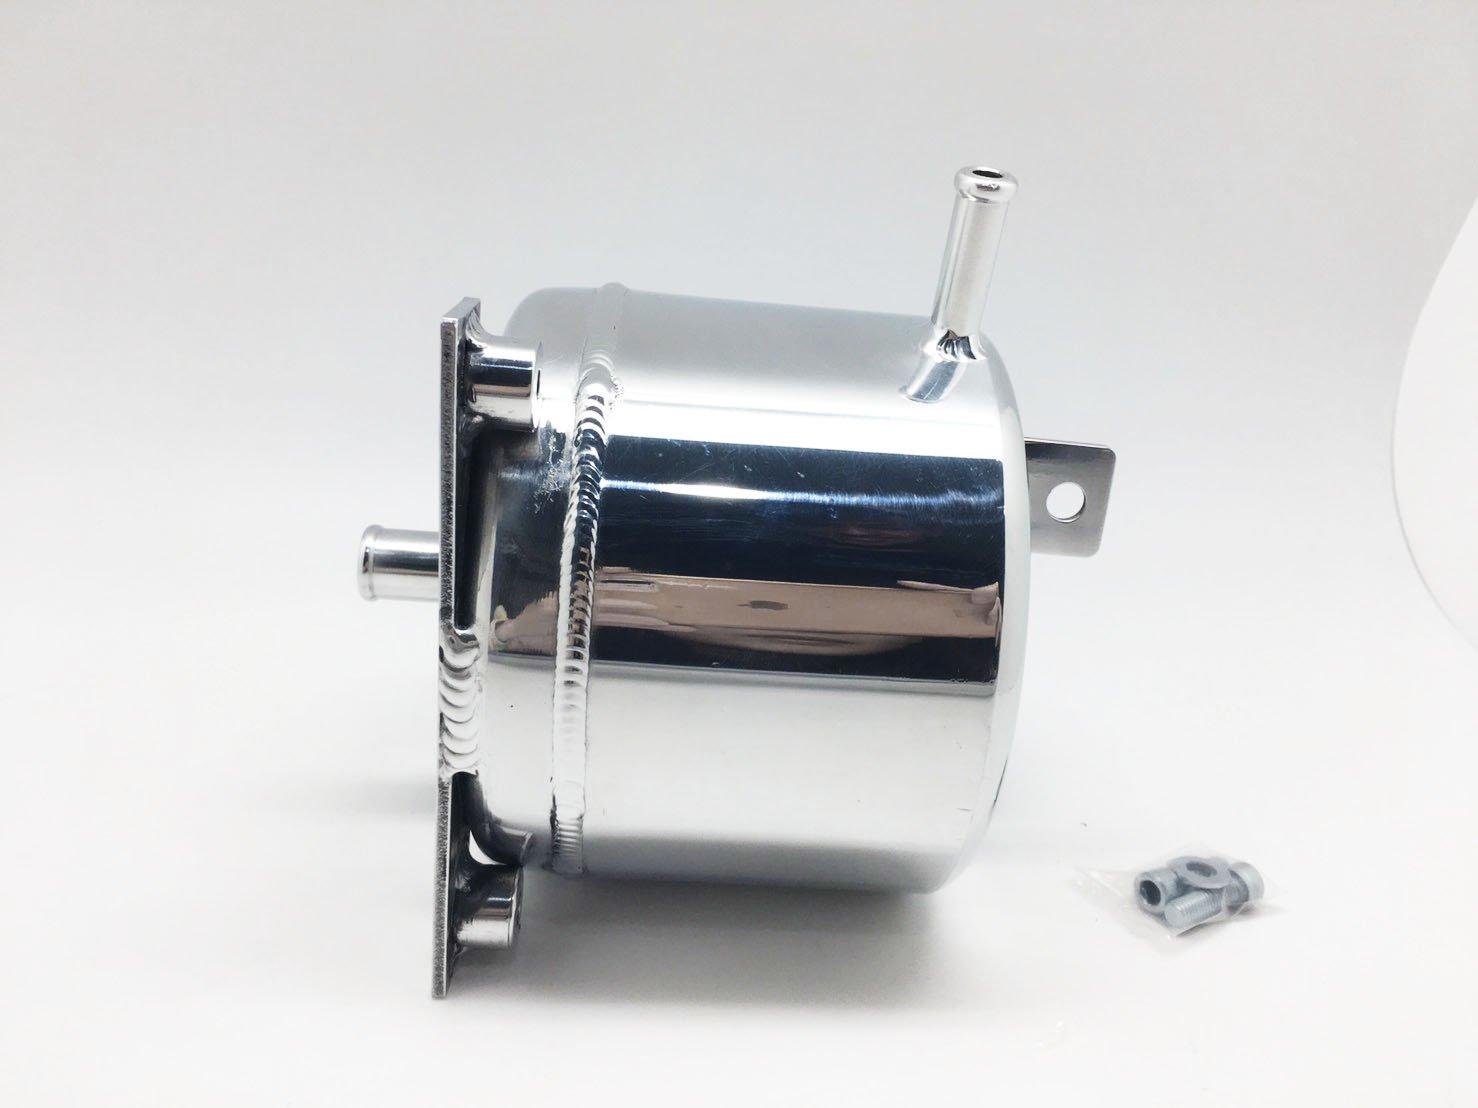 1 Aluminum Radiator Coolant Header Overflow Tank Fits Mini Cooper S R50 R53 Mk1